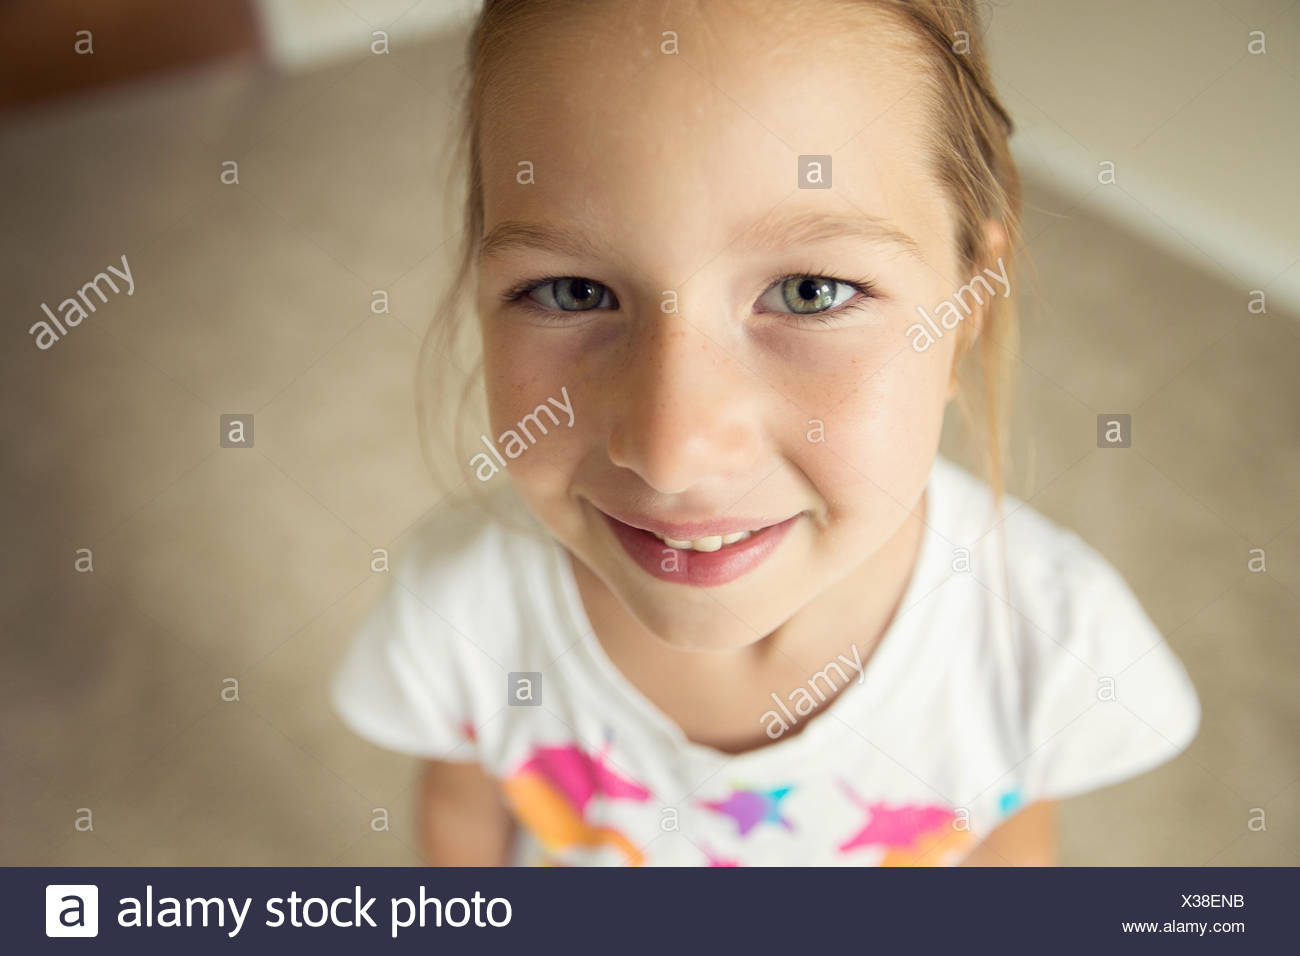 Retrato de niña sonriente (6-7) mirando a la cámara Imagen De Stock